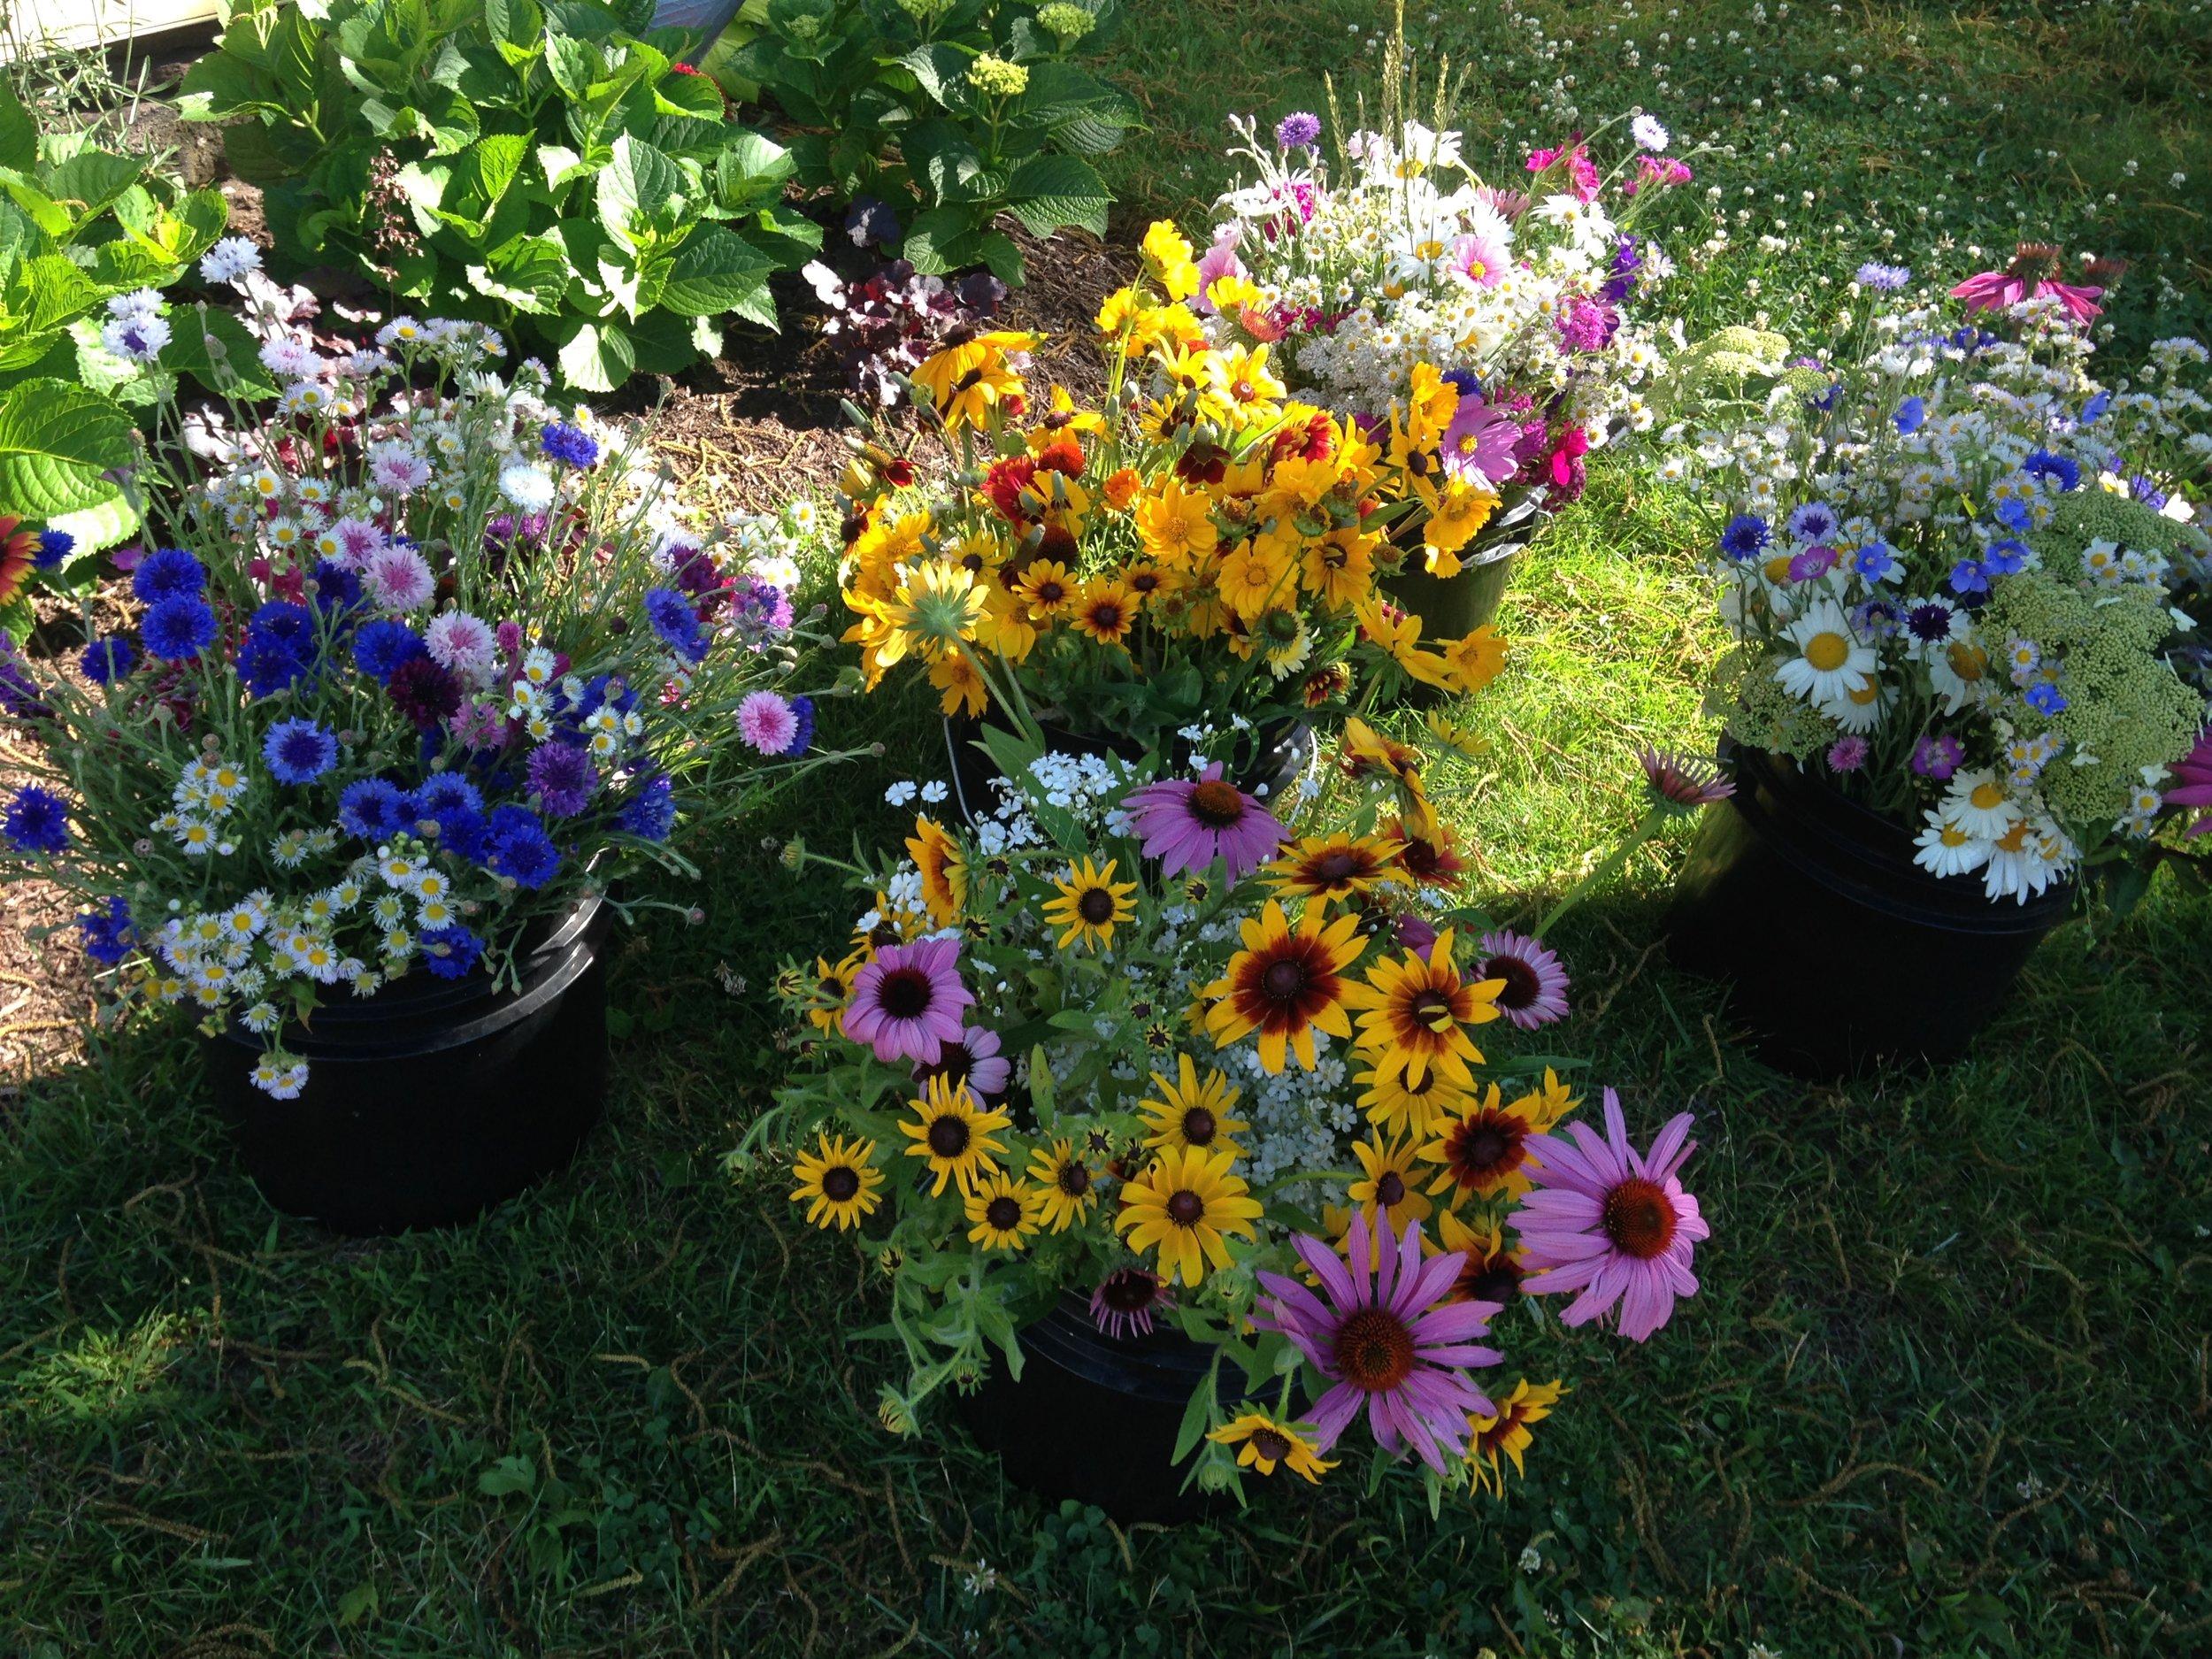 buckets of wildflowers.JPG